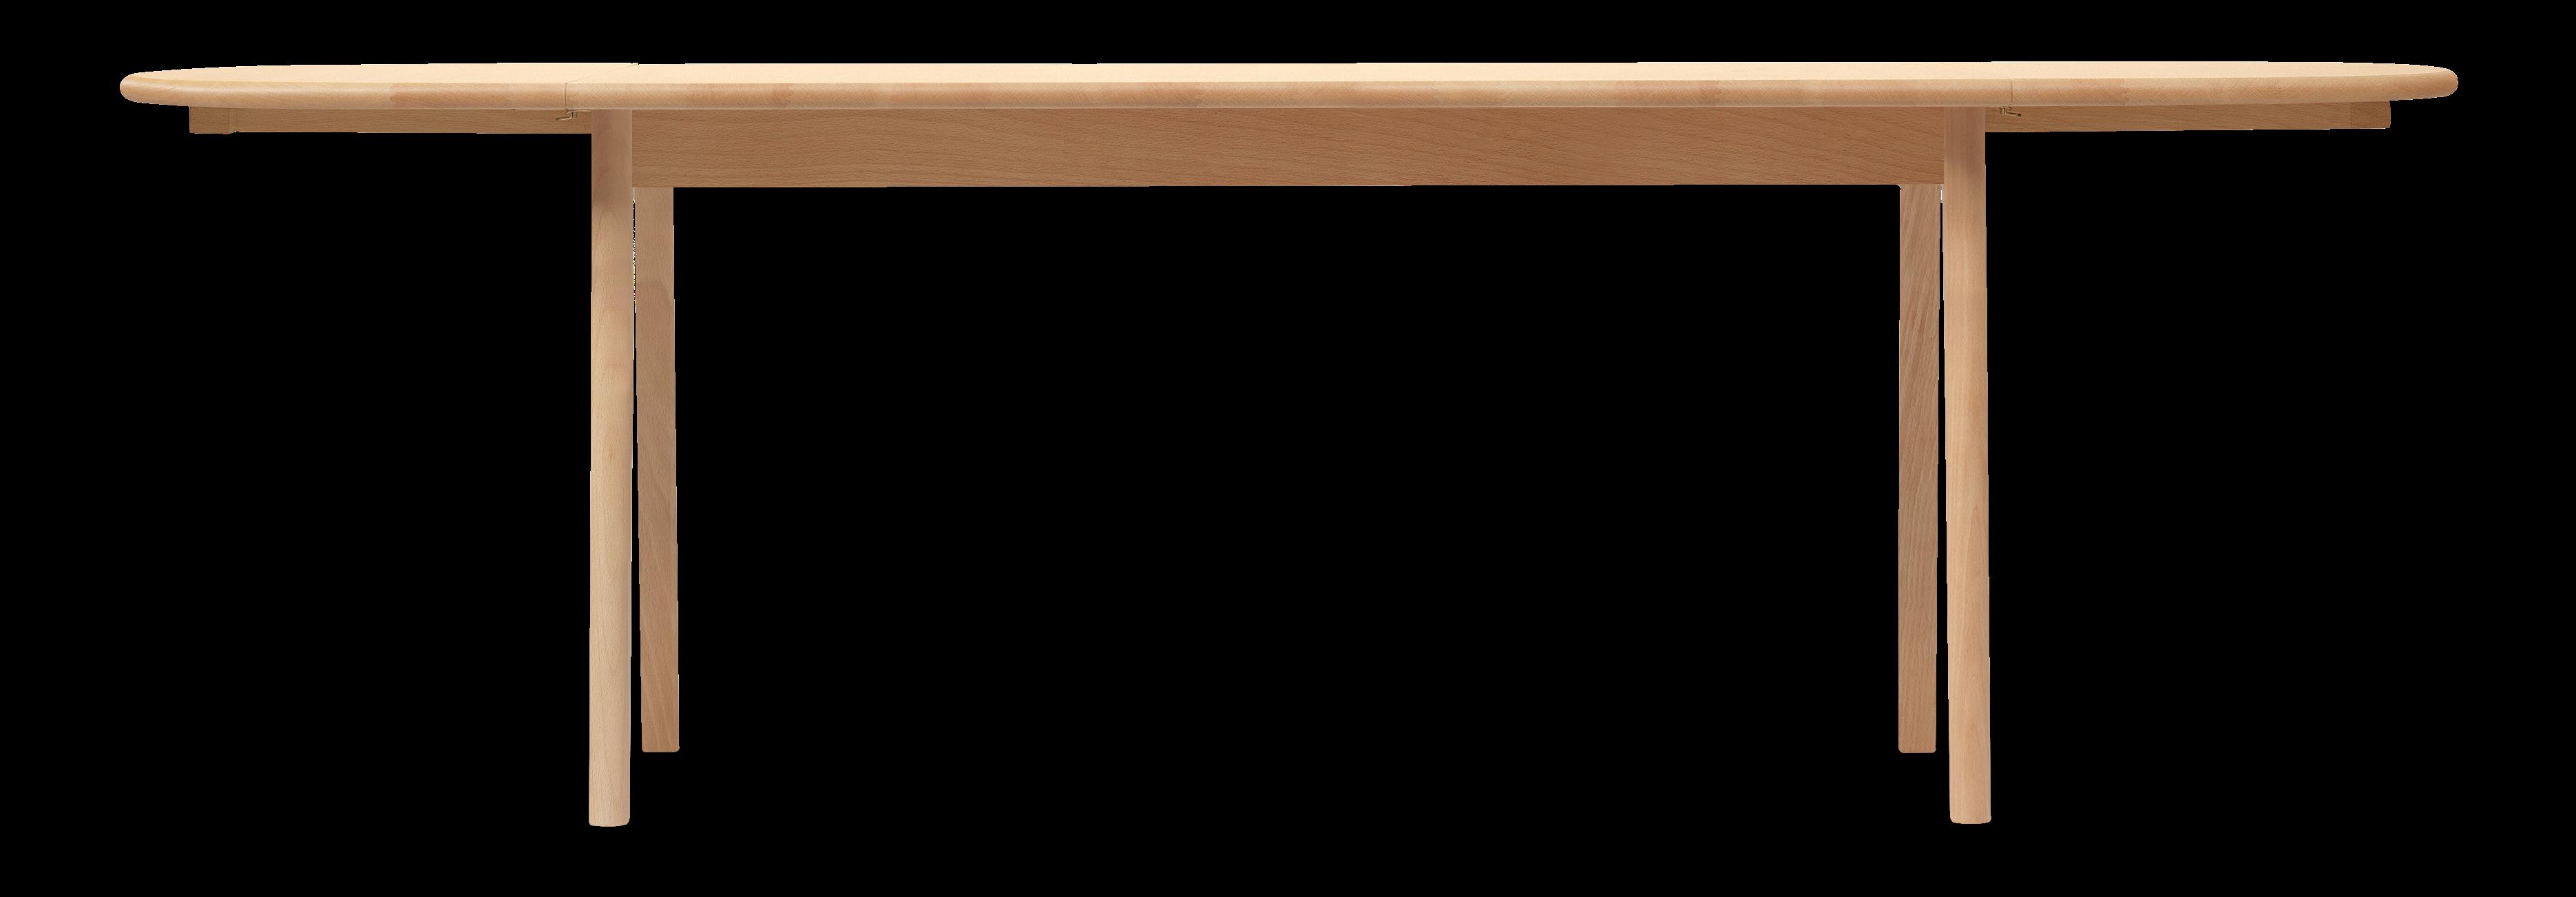 CH006